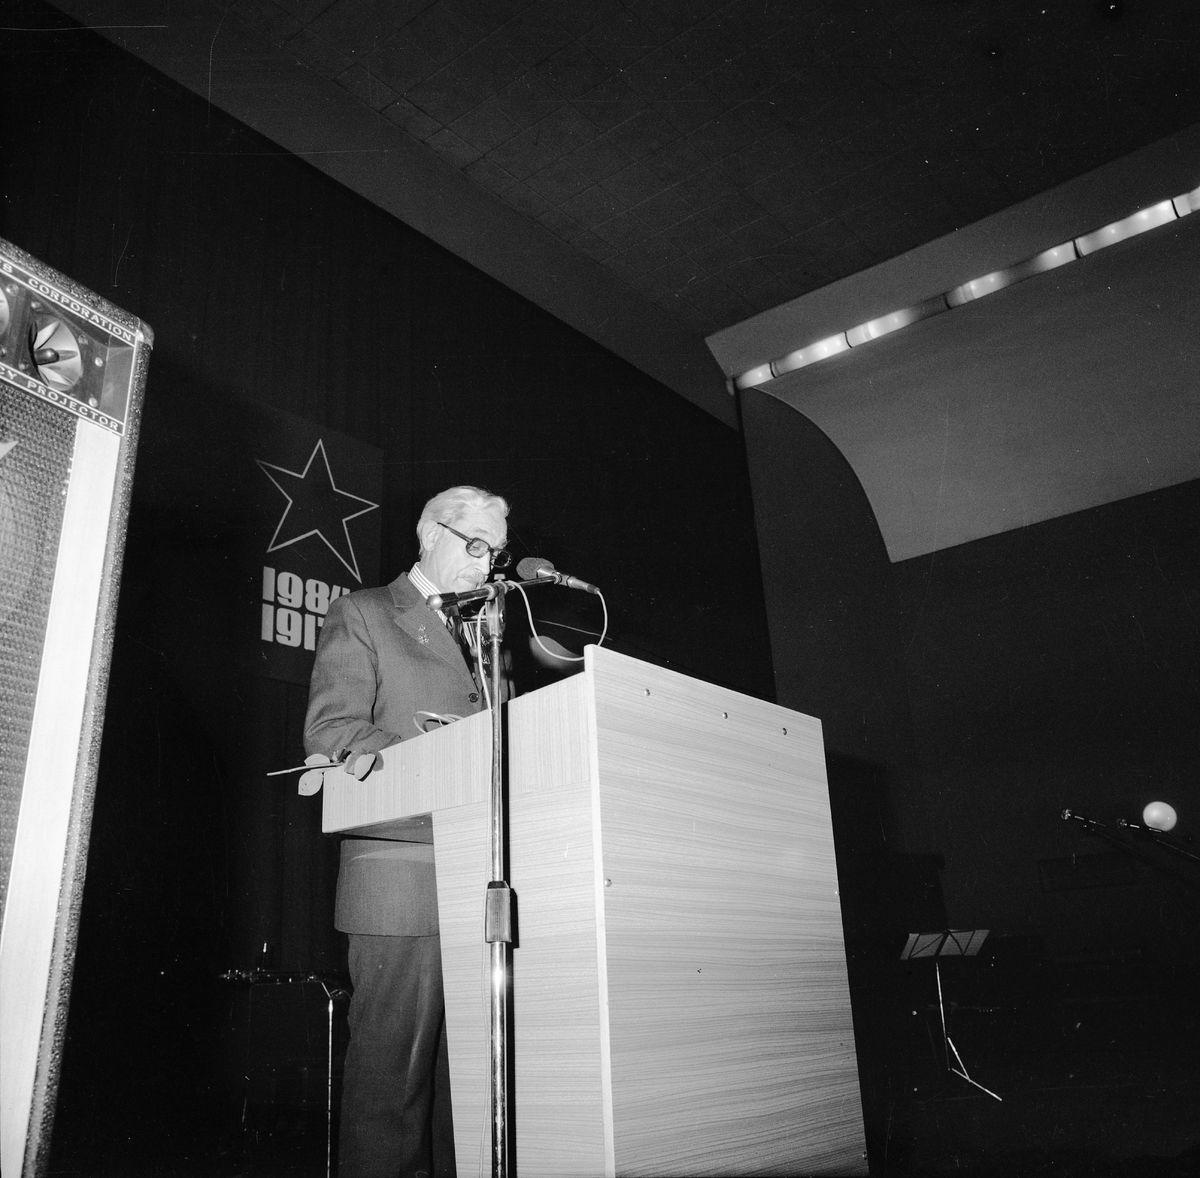 Wizyta konsula ZSRR [3]